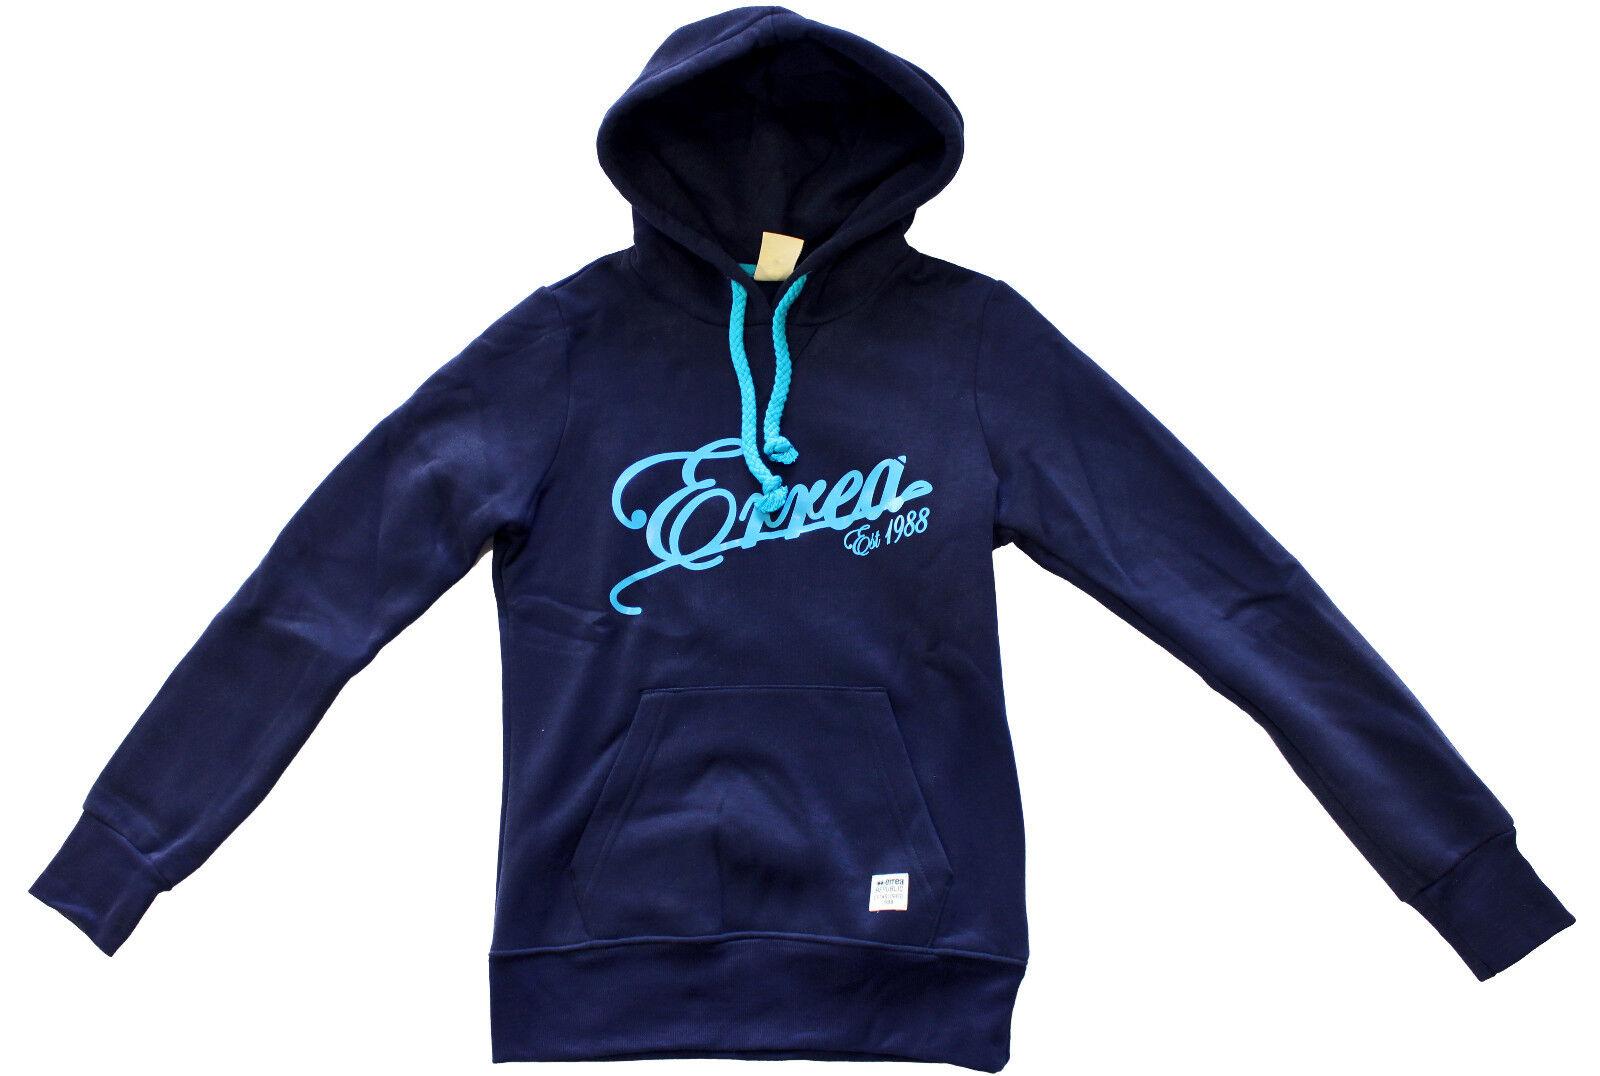 ERREA Miyako bluee junior sweatshirt hooded felpa ragazza blue con cappuccio